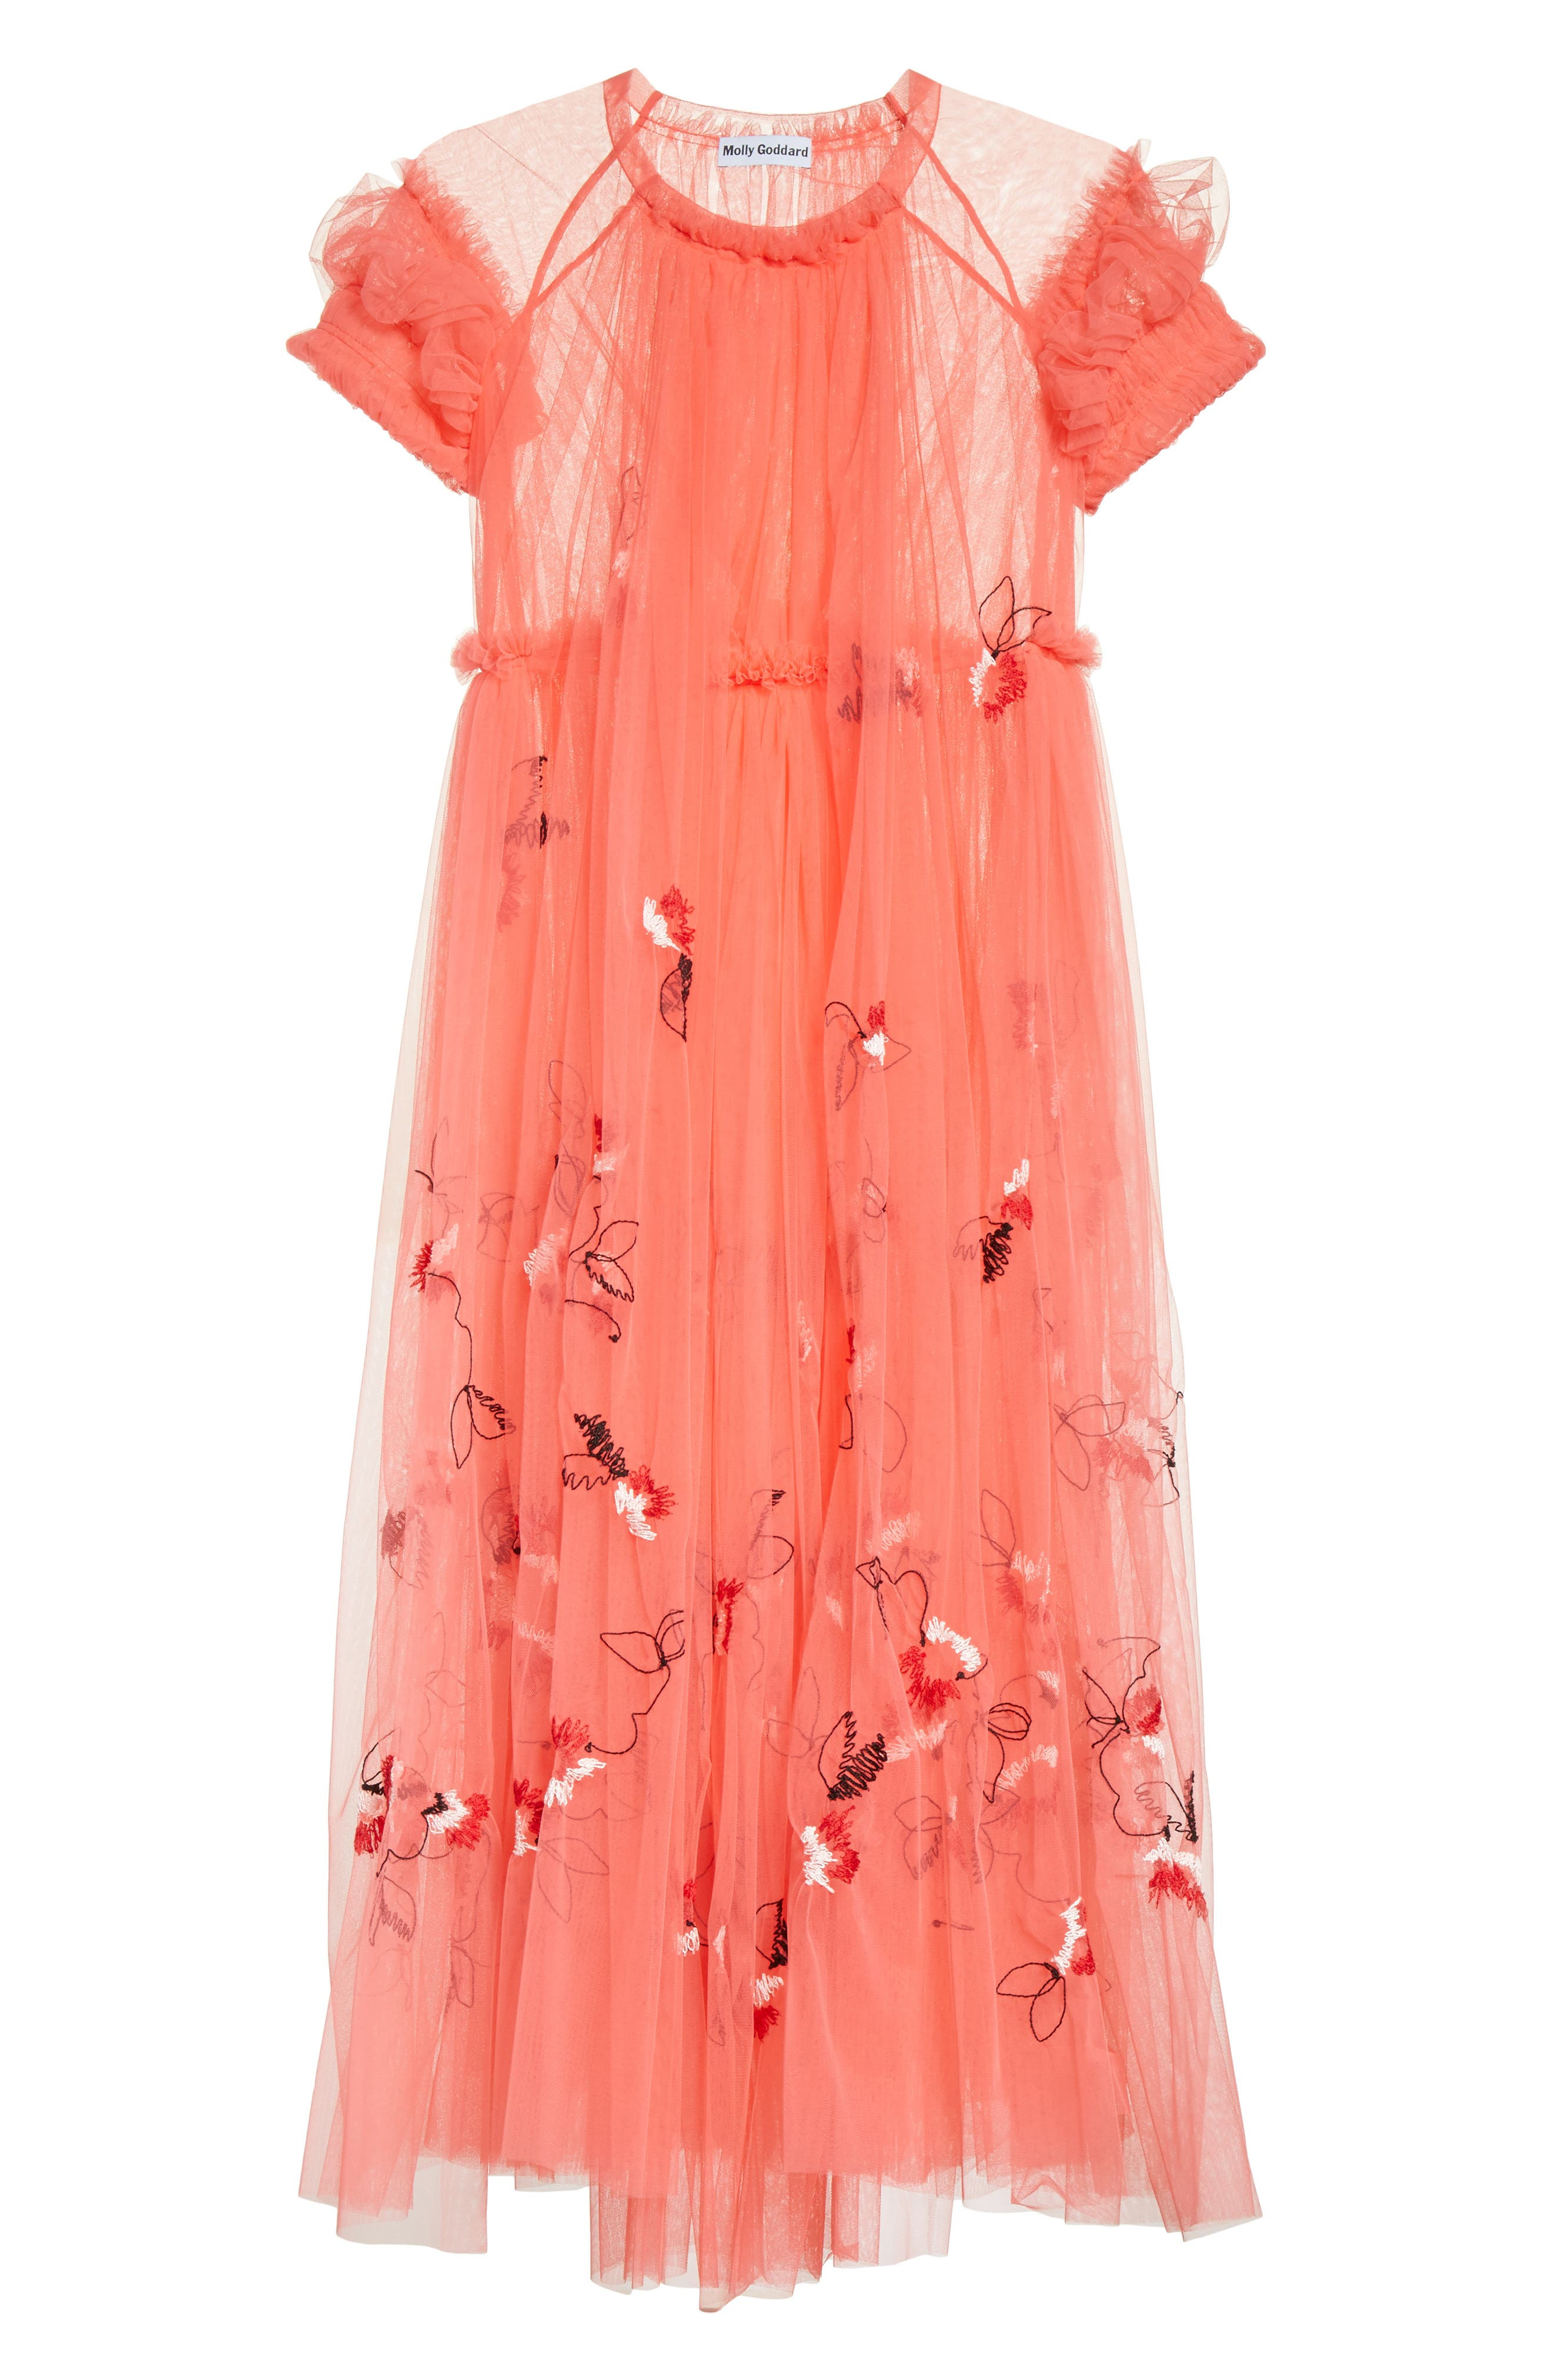 Doris Embroidered Tulle Dress,                             Alternate thumbnail 7, color,                             950